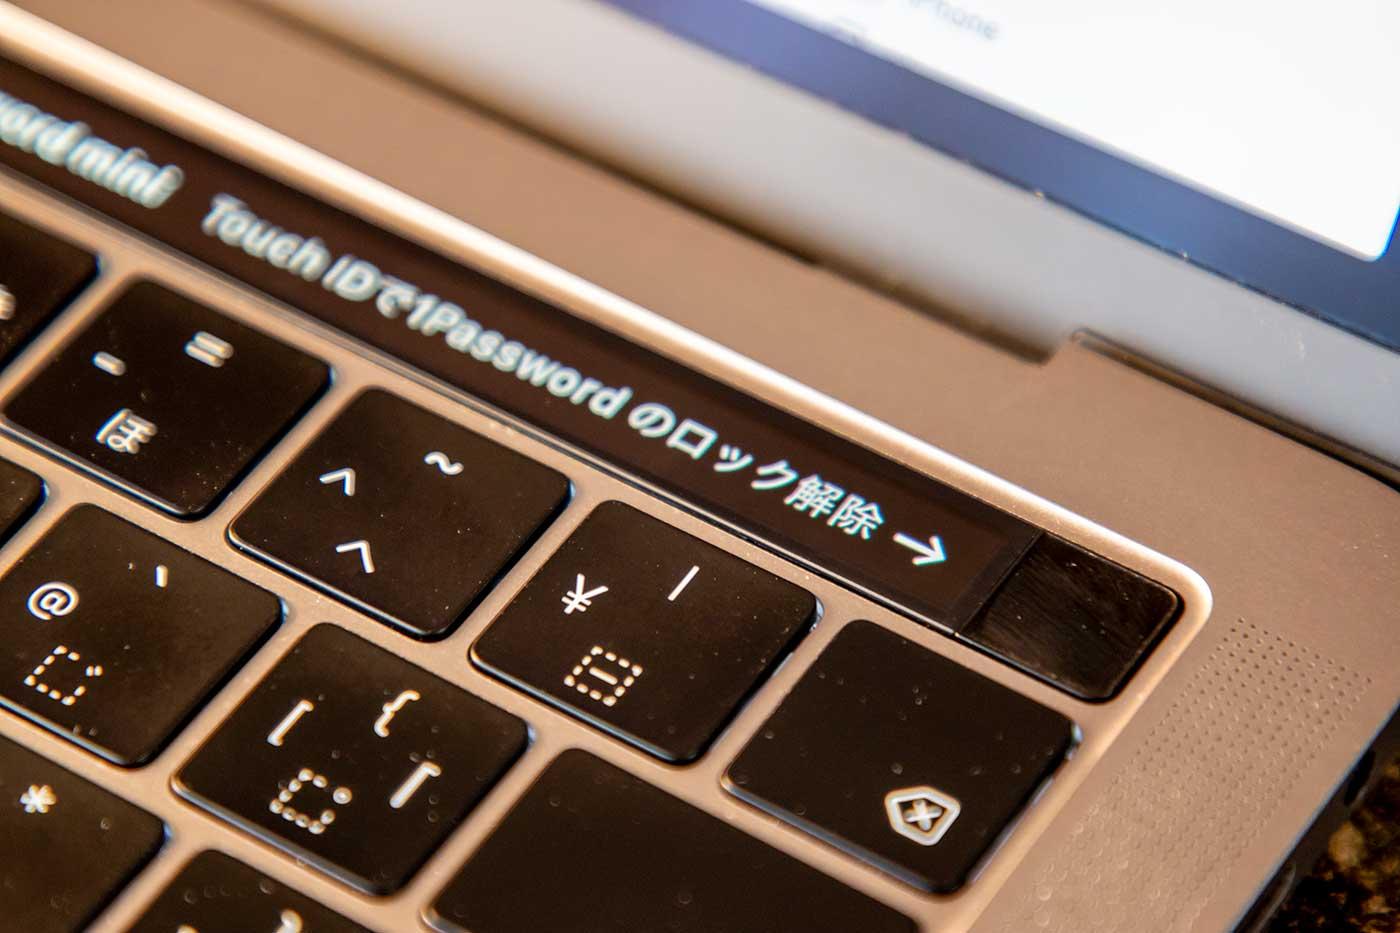 MacBookProの指紋認証